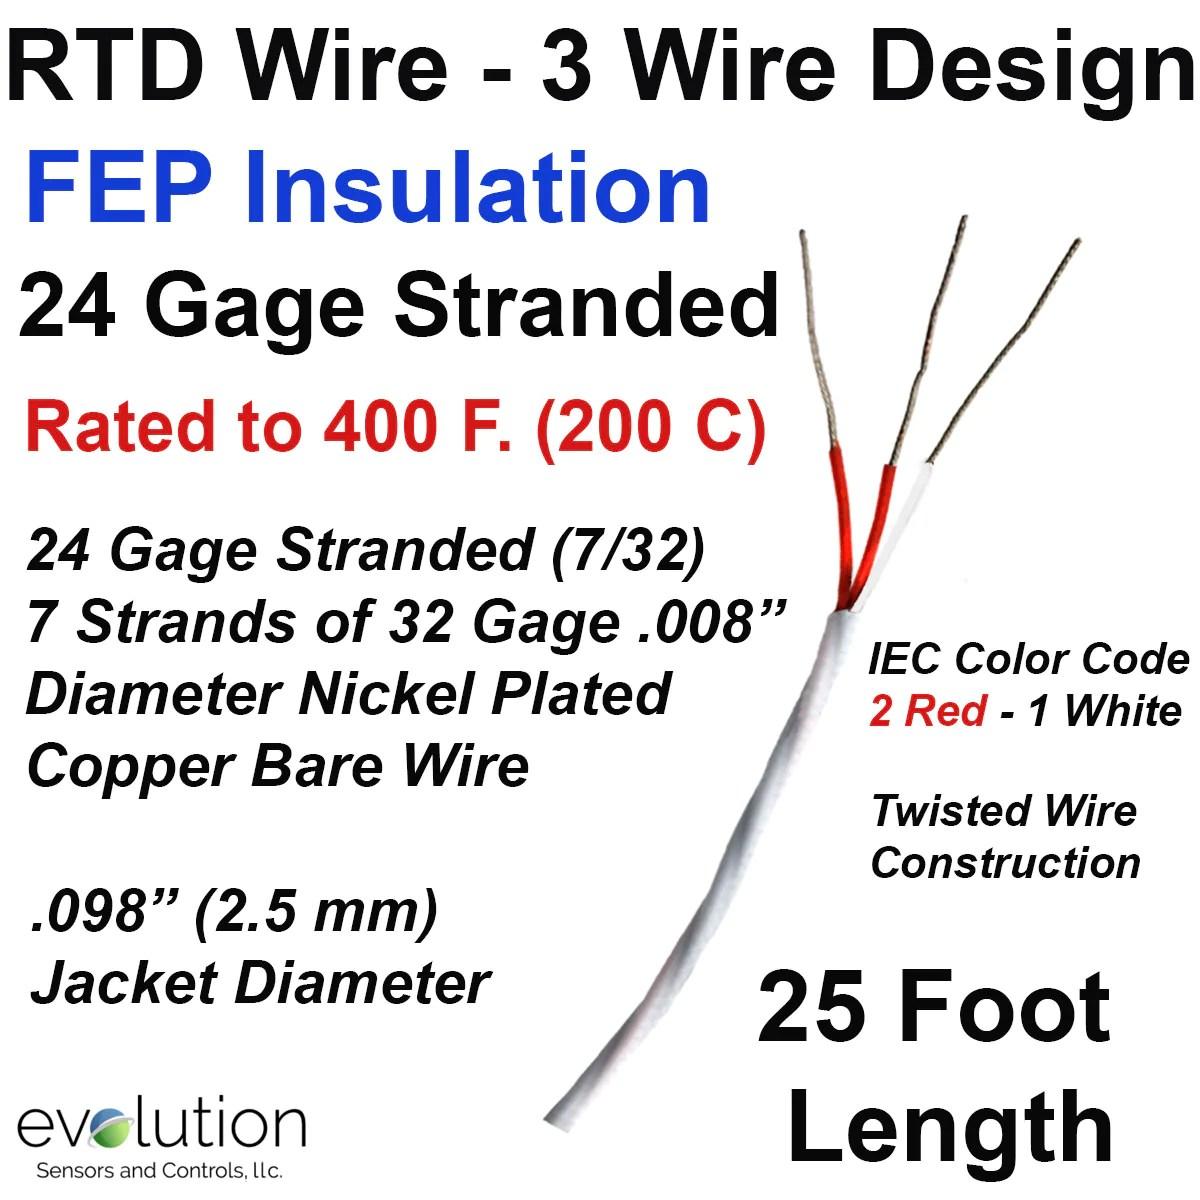 medium resolution of rtd wiring color code home wiring diagram rtd 3 wire color code rtd wire 3 wire